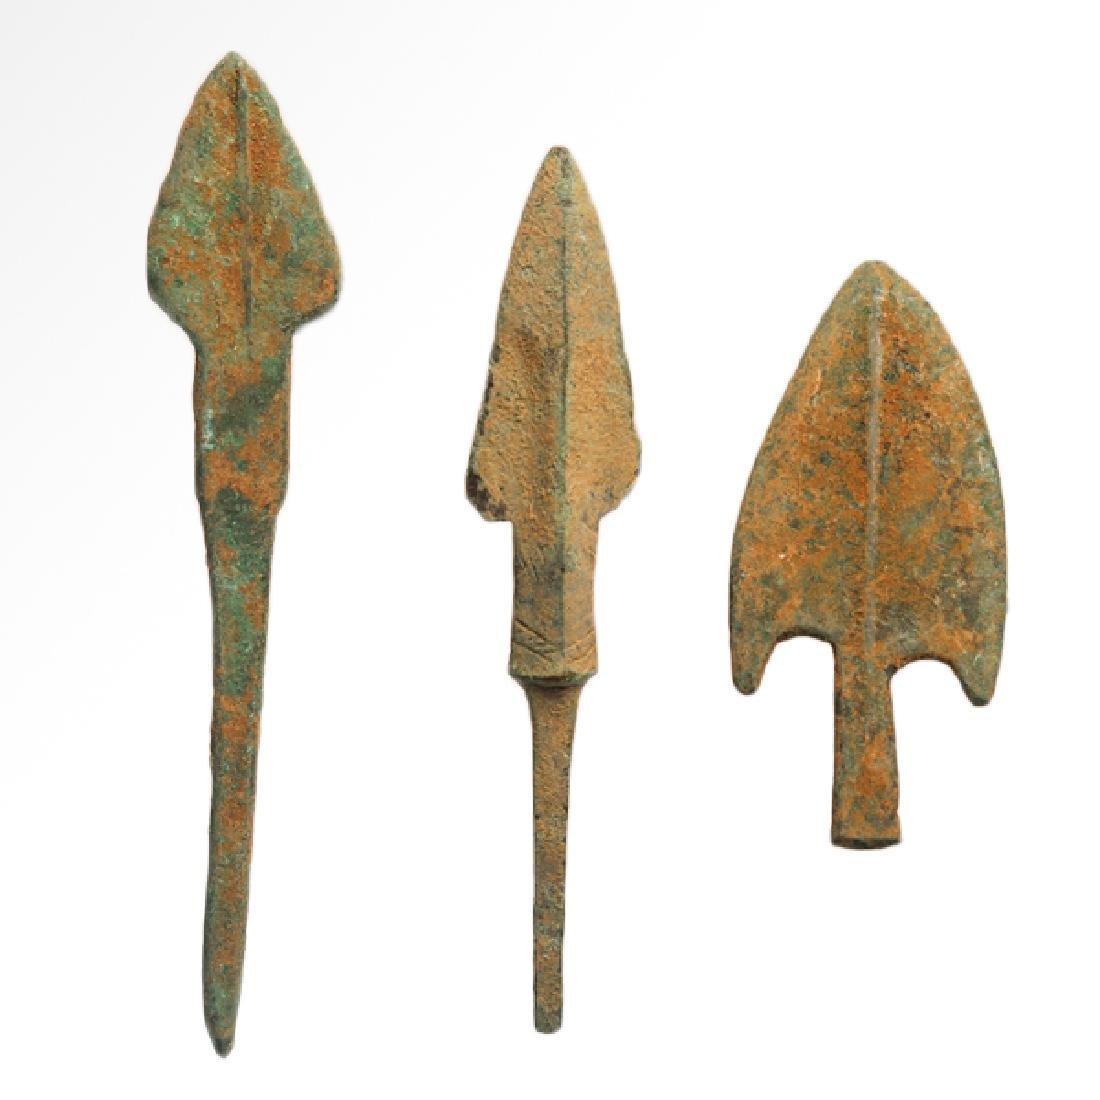 Three Roman Bronze Arrow-heads, c. 100-200 A.D .